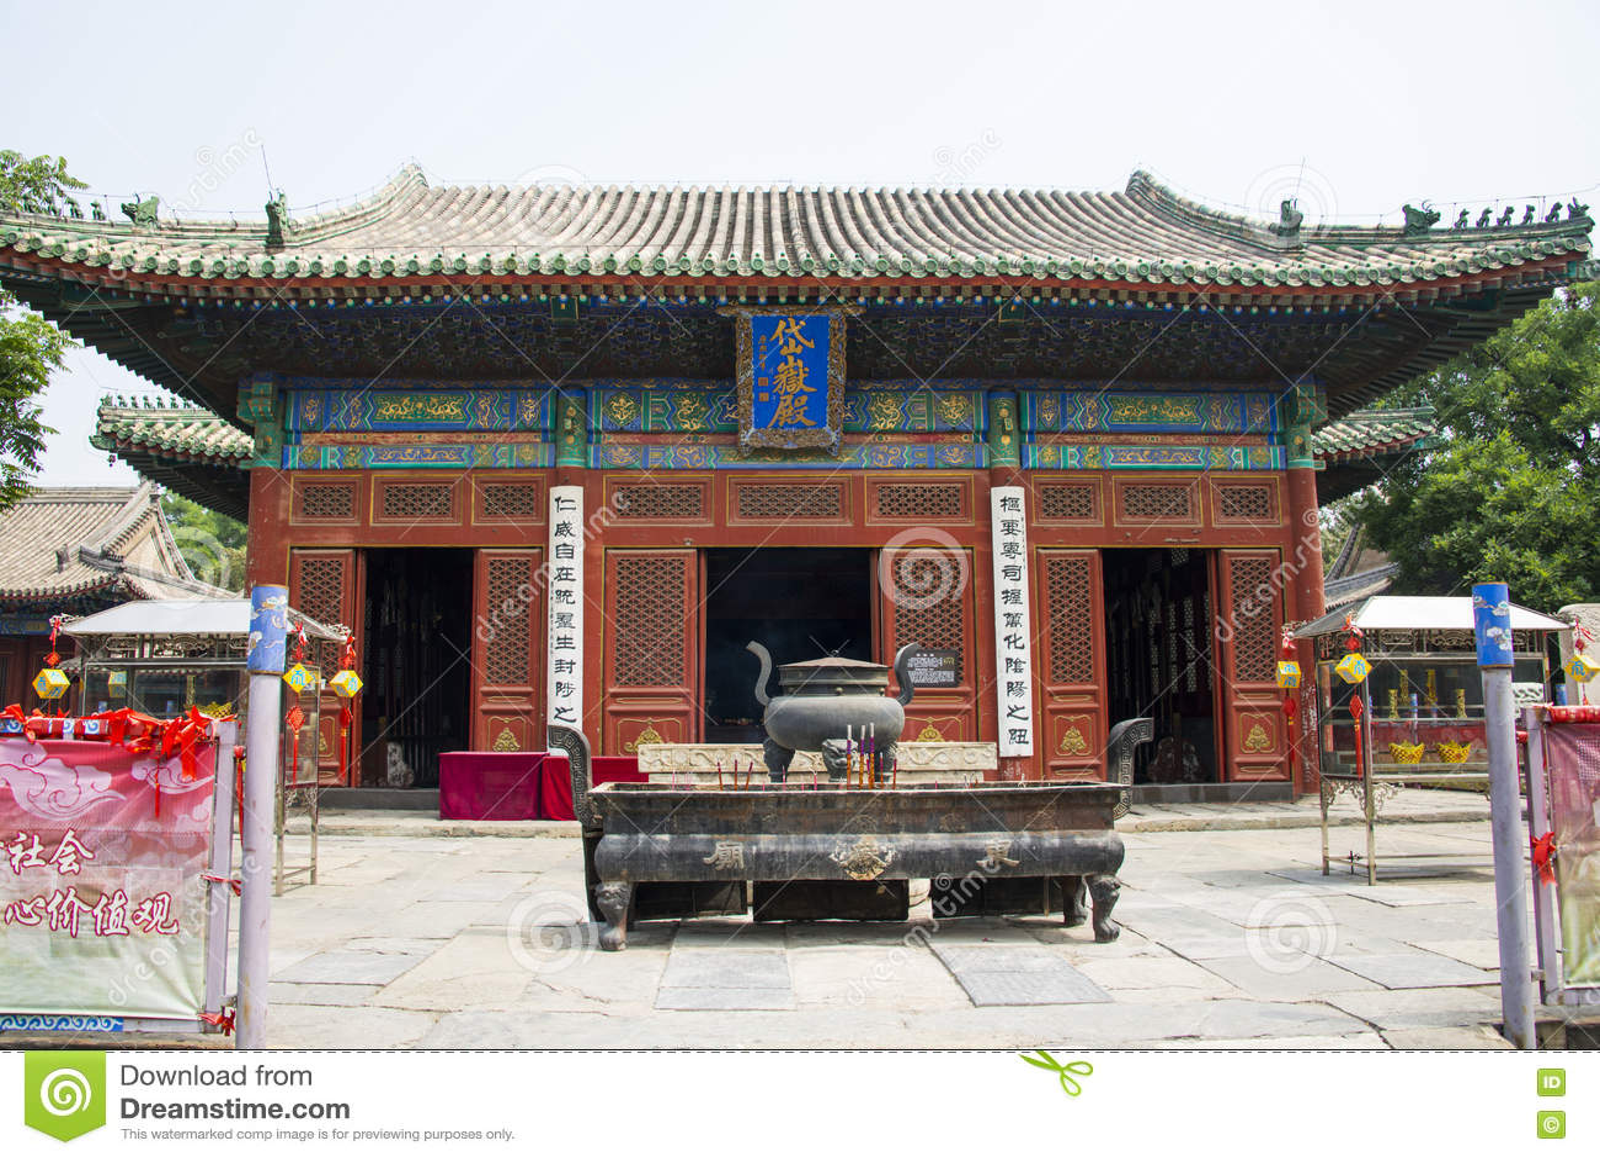 Asia China Beijing Dongyue Temple Landscape Architecture - Temple landscape architecture